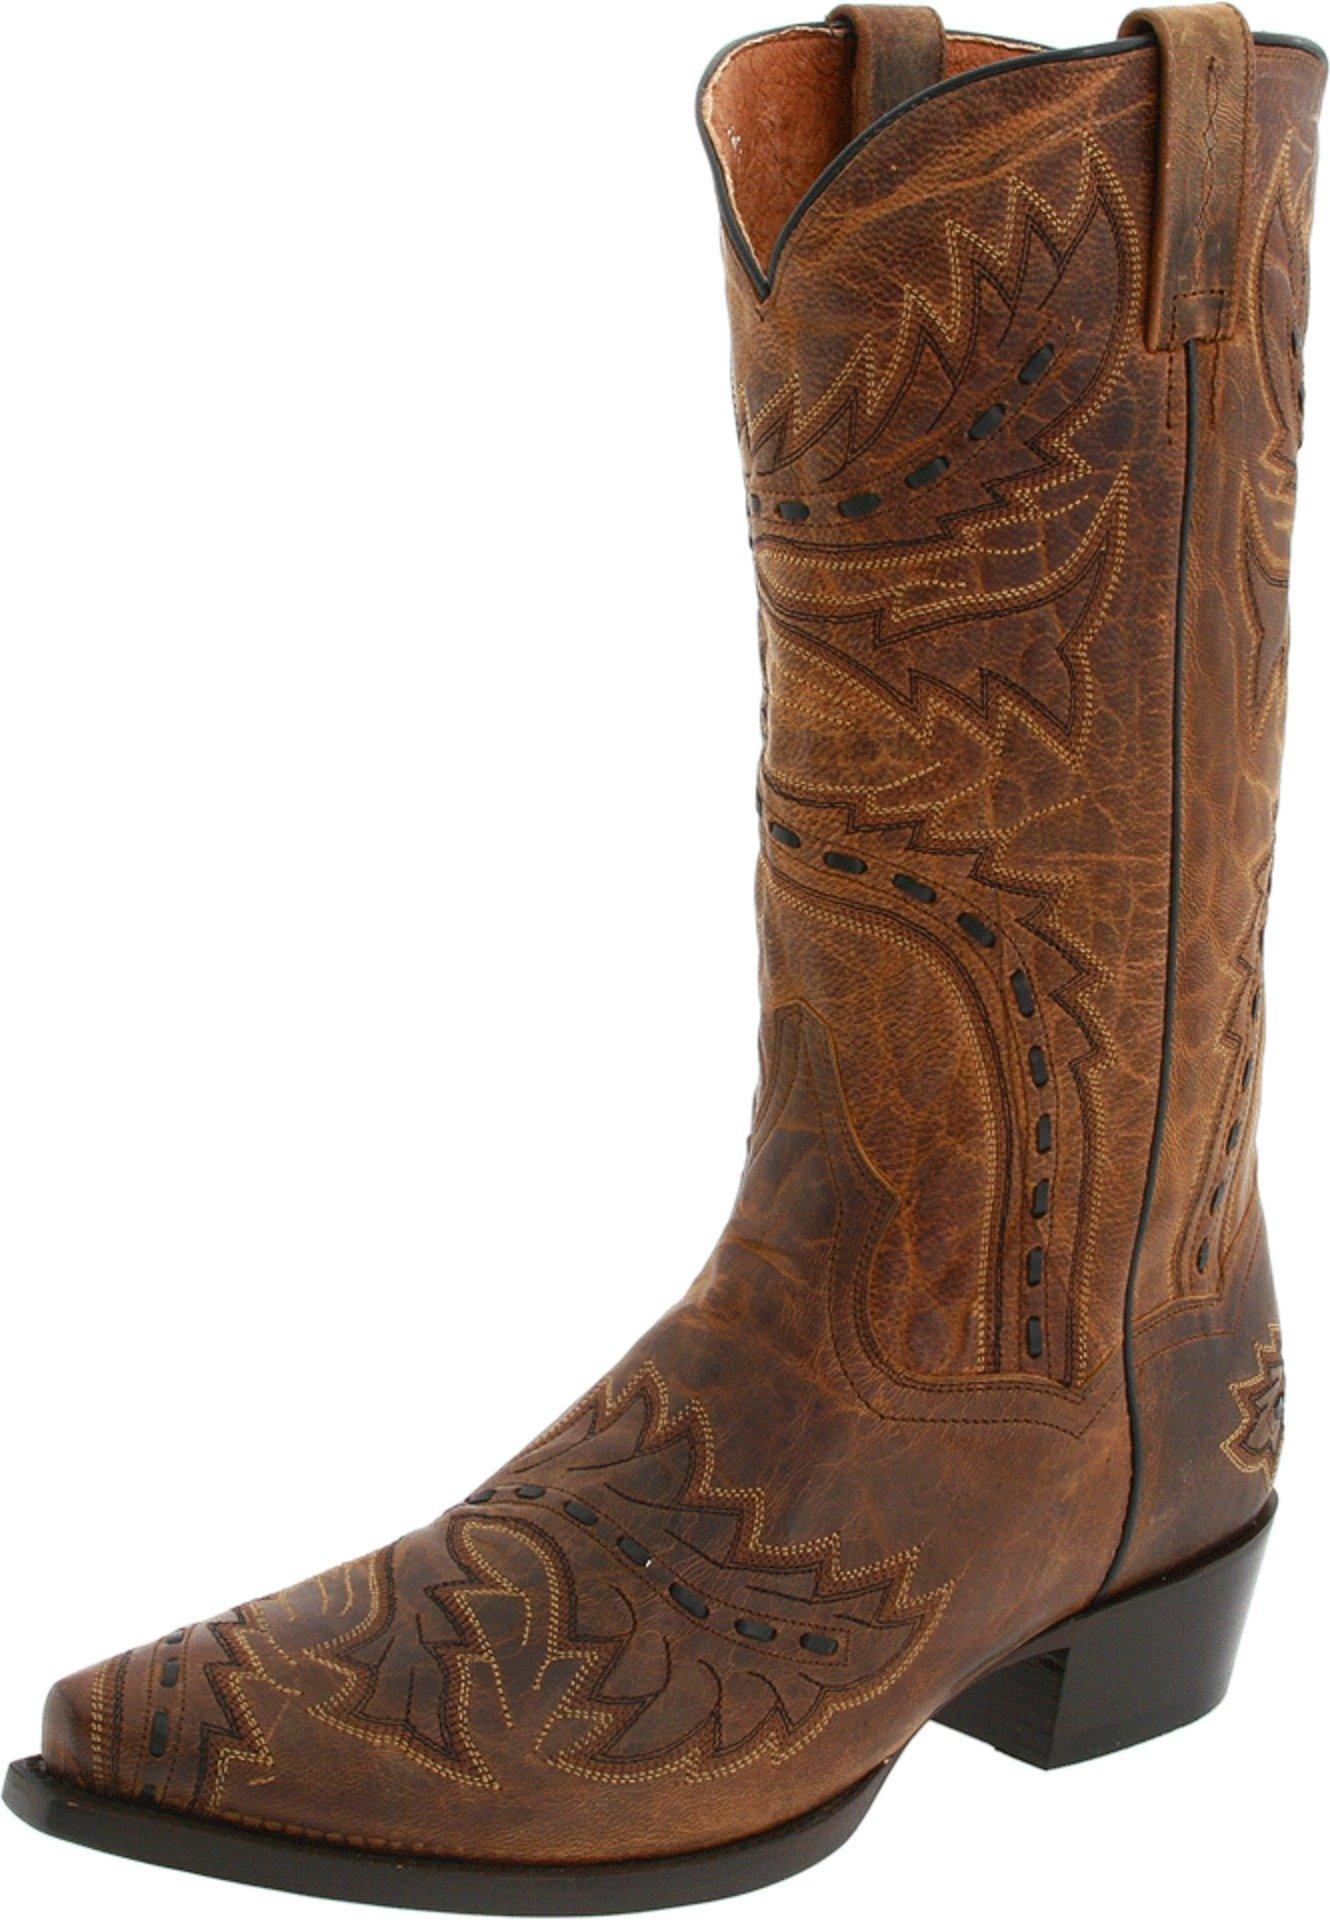 Dan Post Men's Sidewinder Western Boot,Tan,10.5 D US